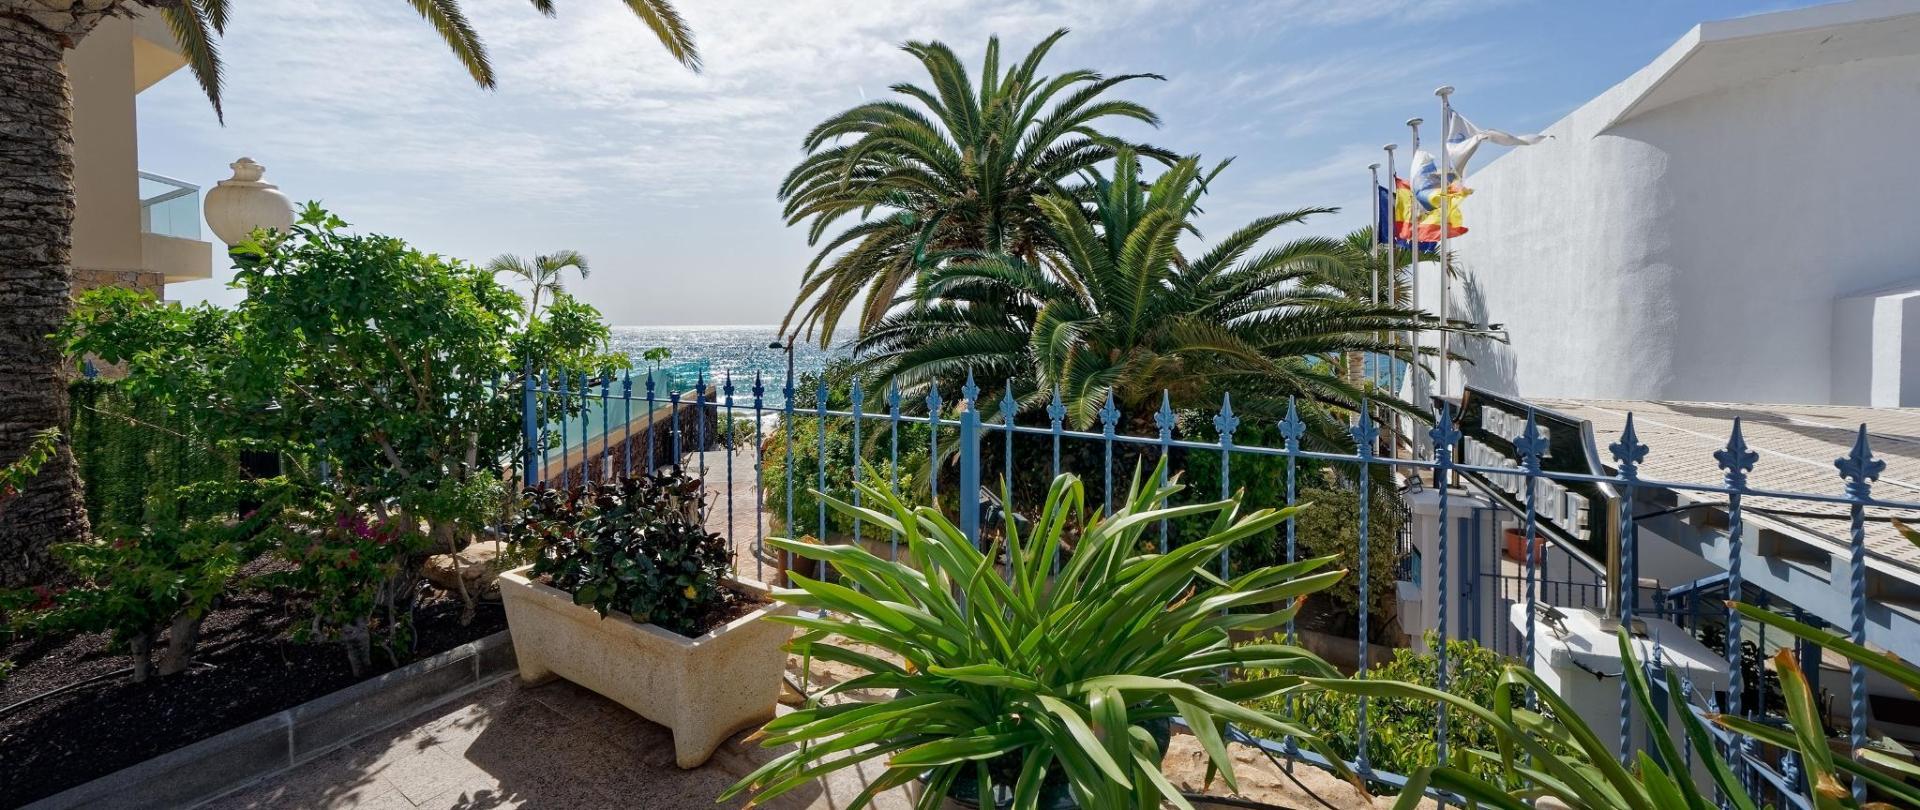 Garden Seaview Oceanview Igramar Morro Jable